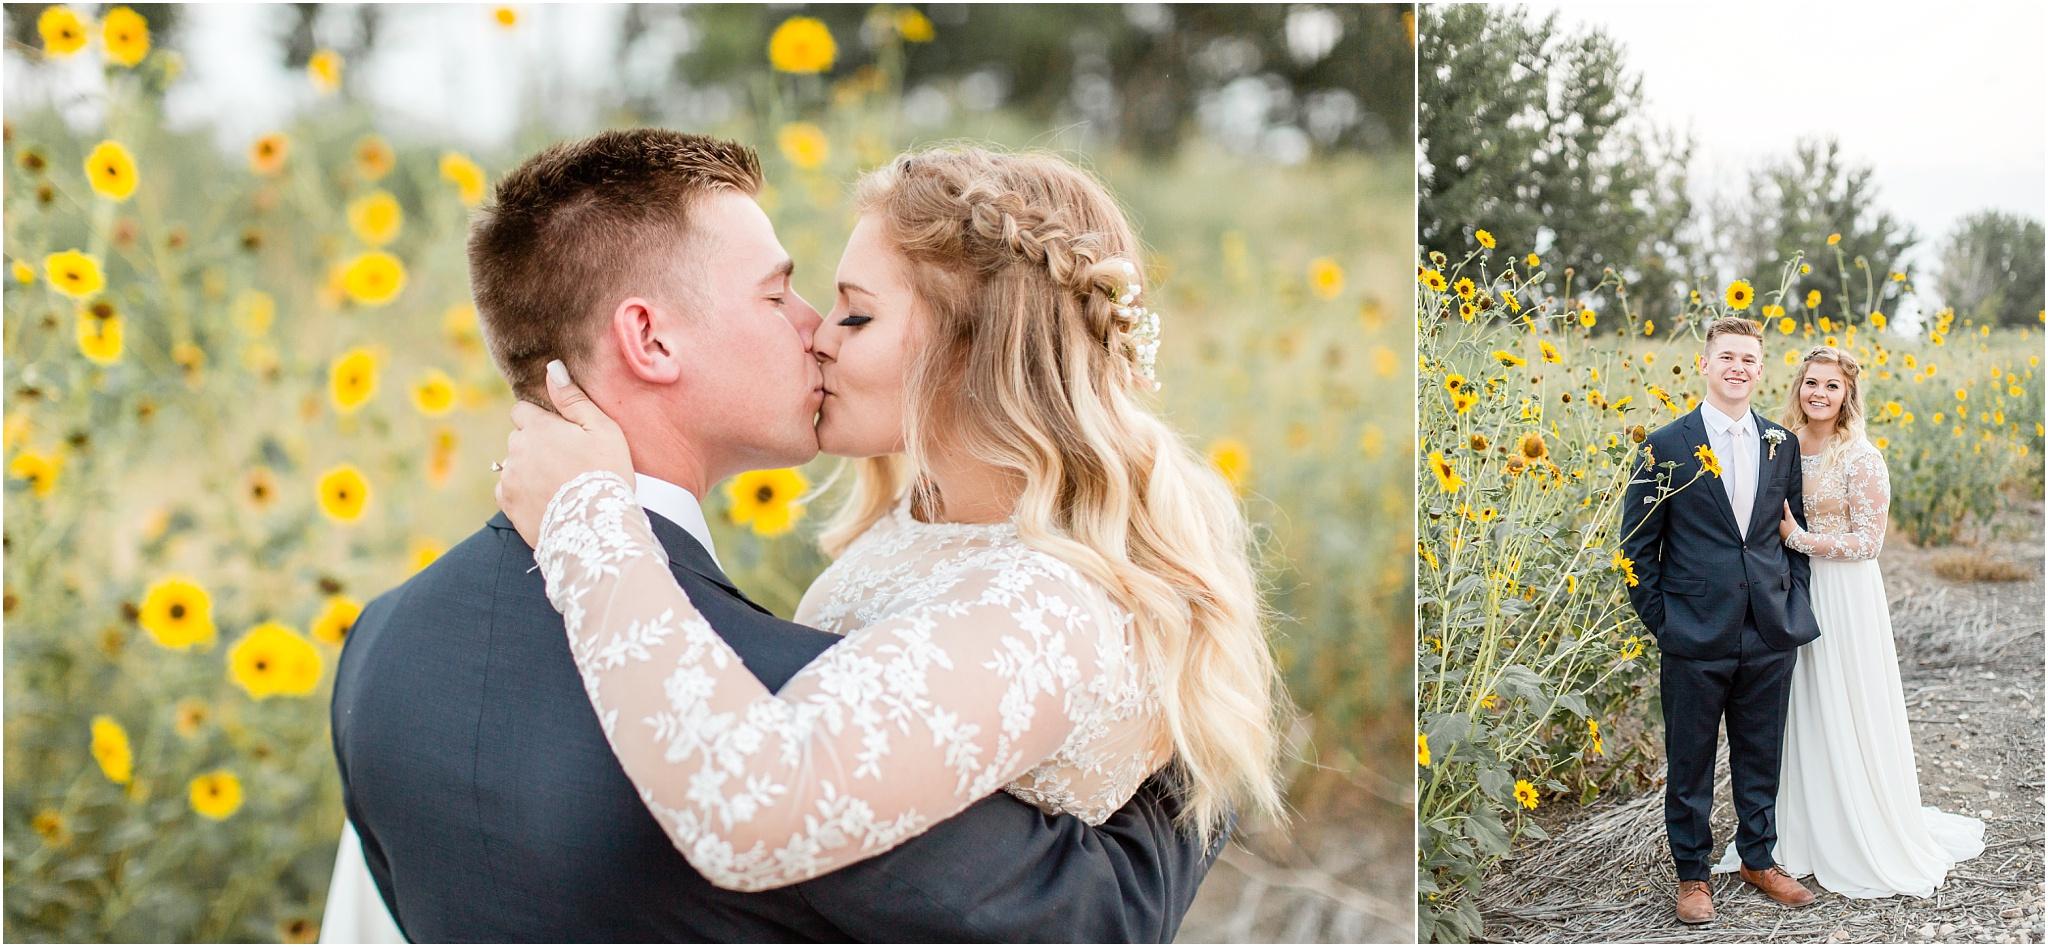 Wedding Photography_Meridian Idaho Temple_Boise Idaho_Nampa Idaho_Leah Southwick Photography_0028.jpg